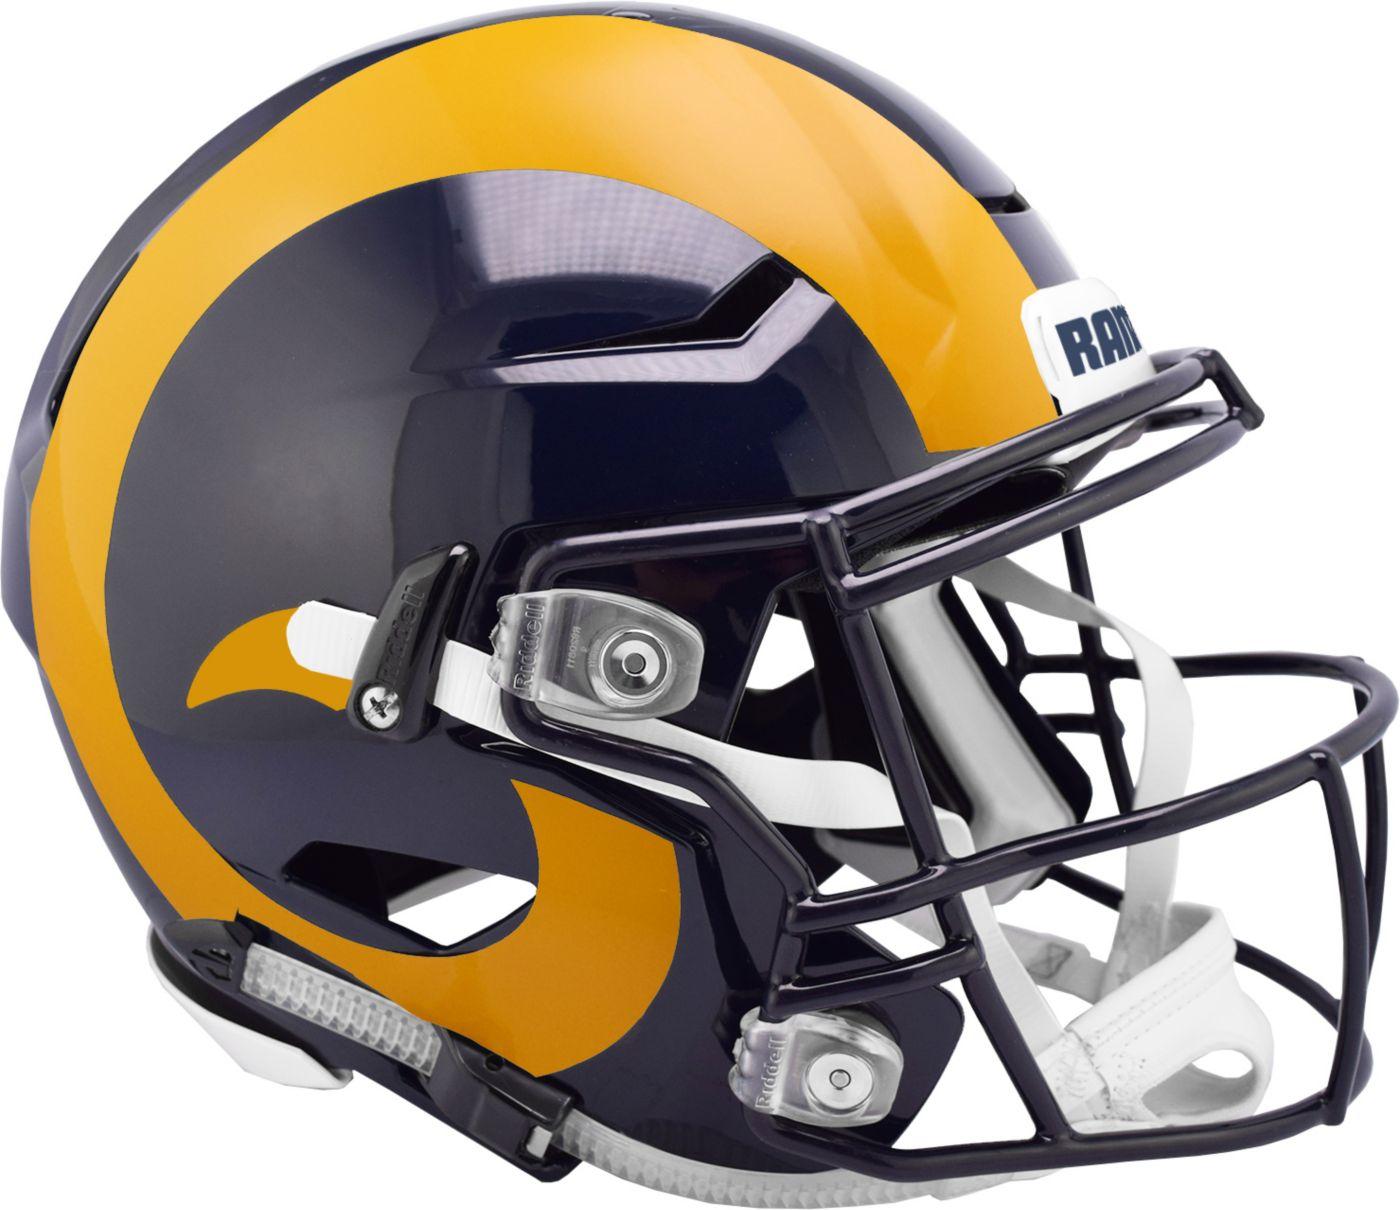 Riddell Los Angeles Rams Speed Flex Authentic Football Helmet